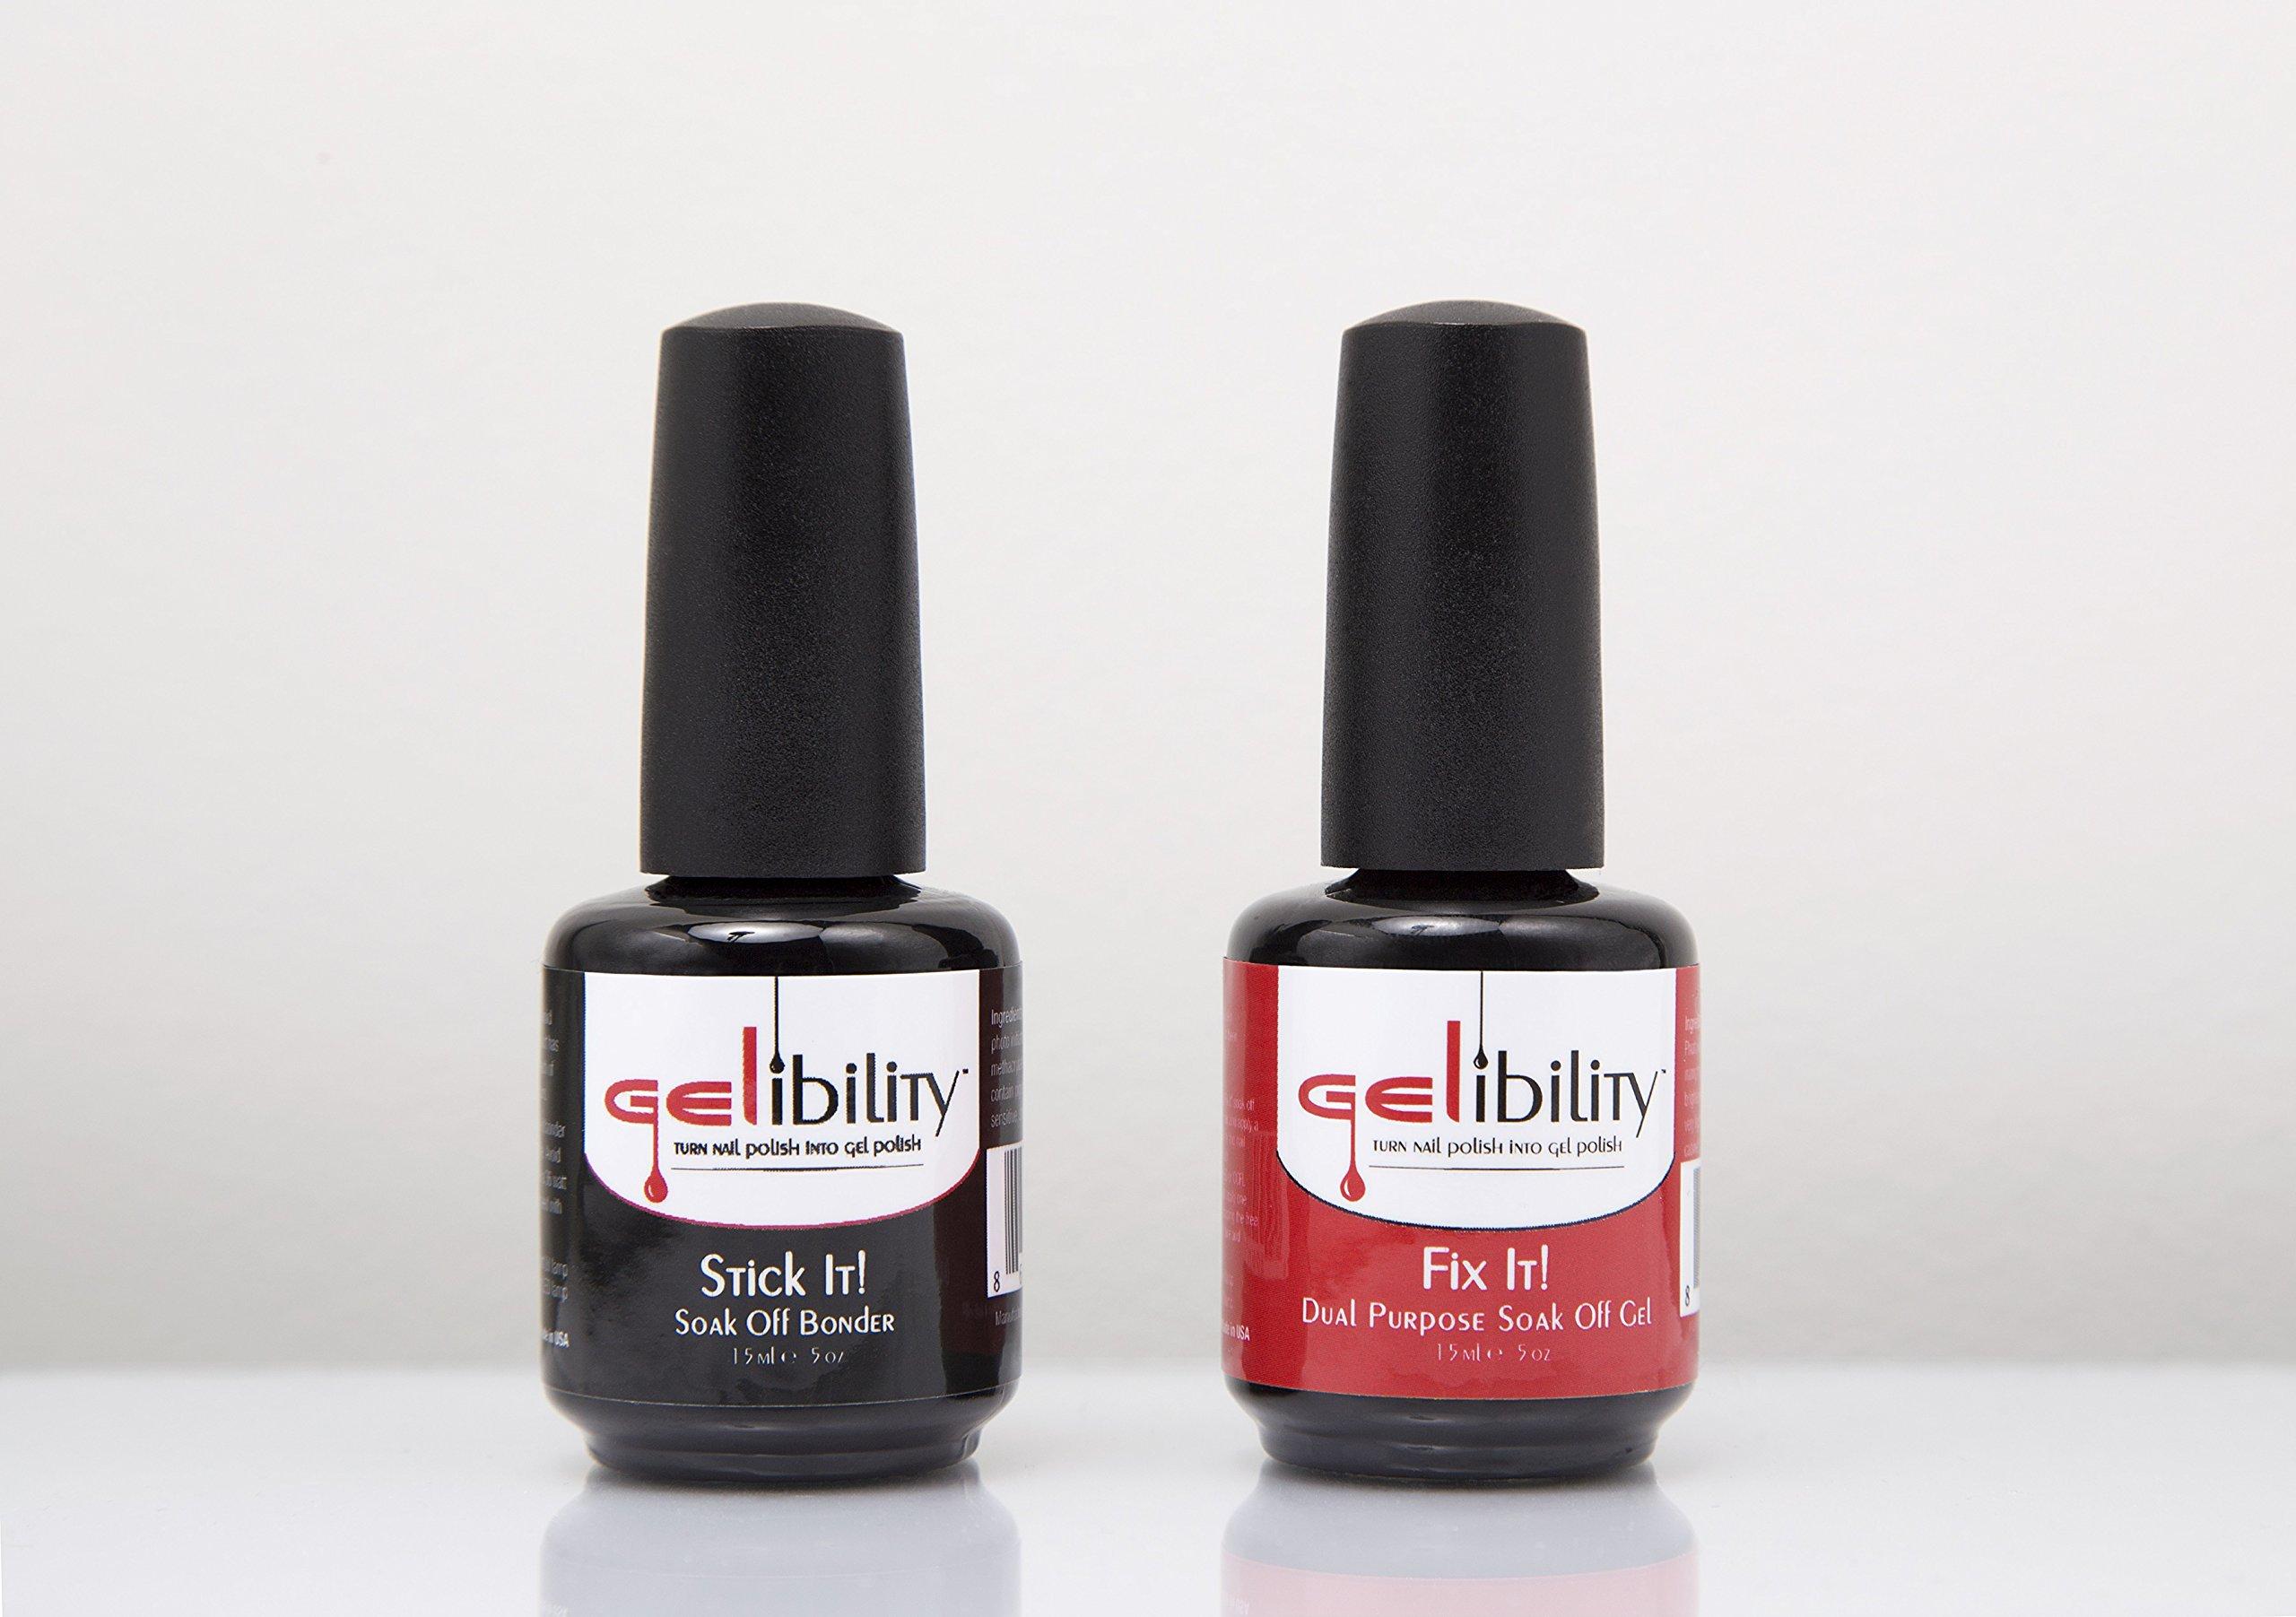 Amazon.com : Gelibility Stick It/Fix It set- Turn nail polish into ...